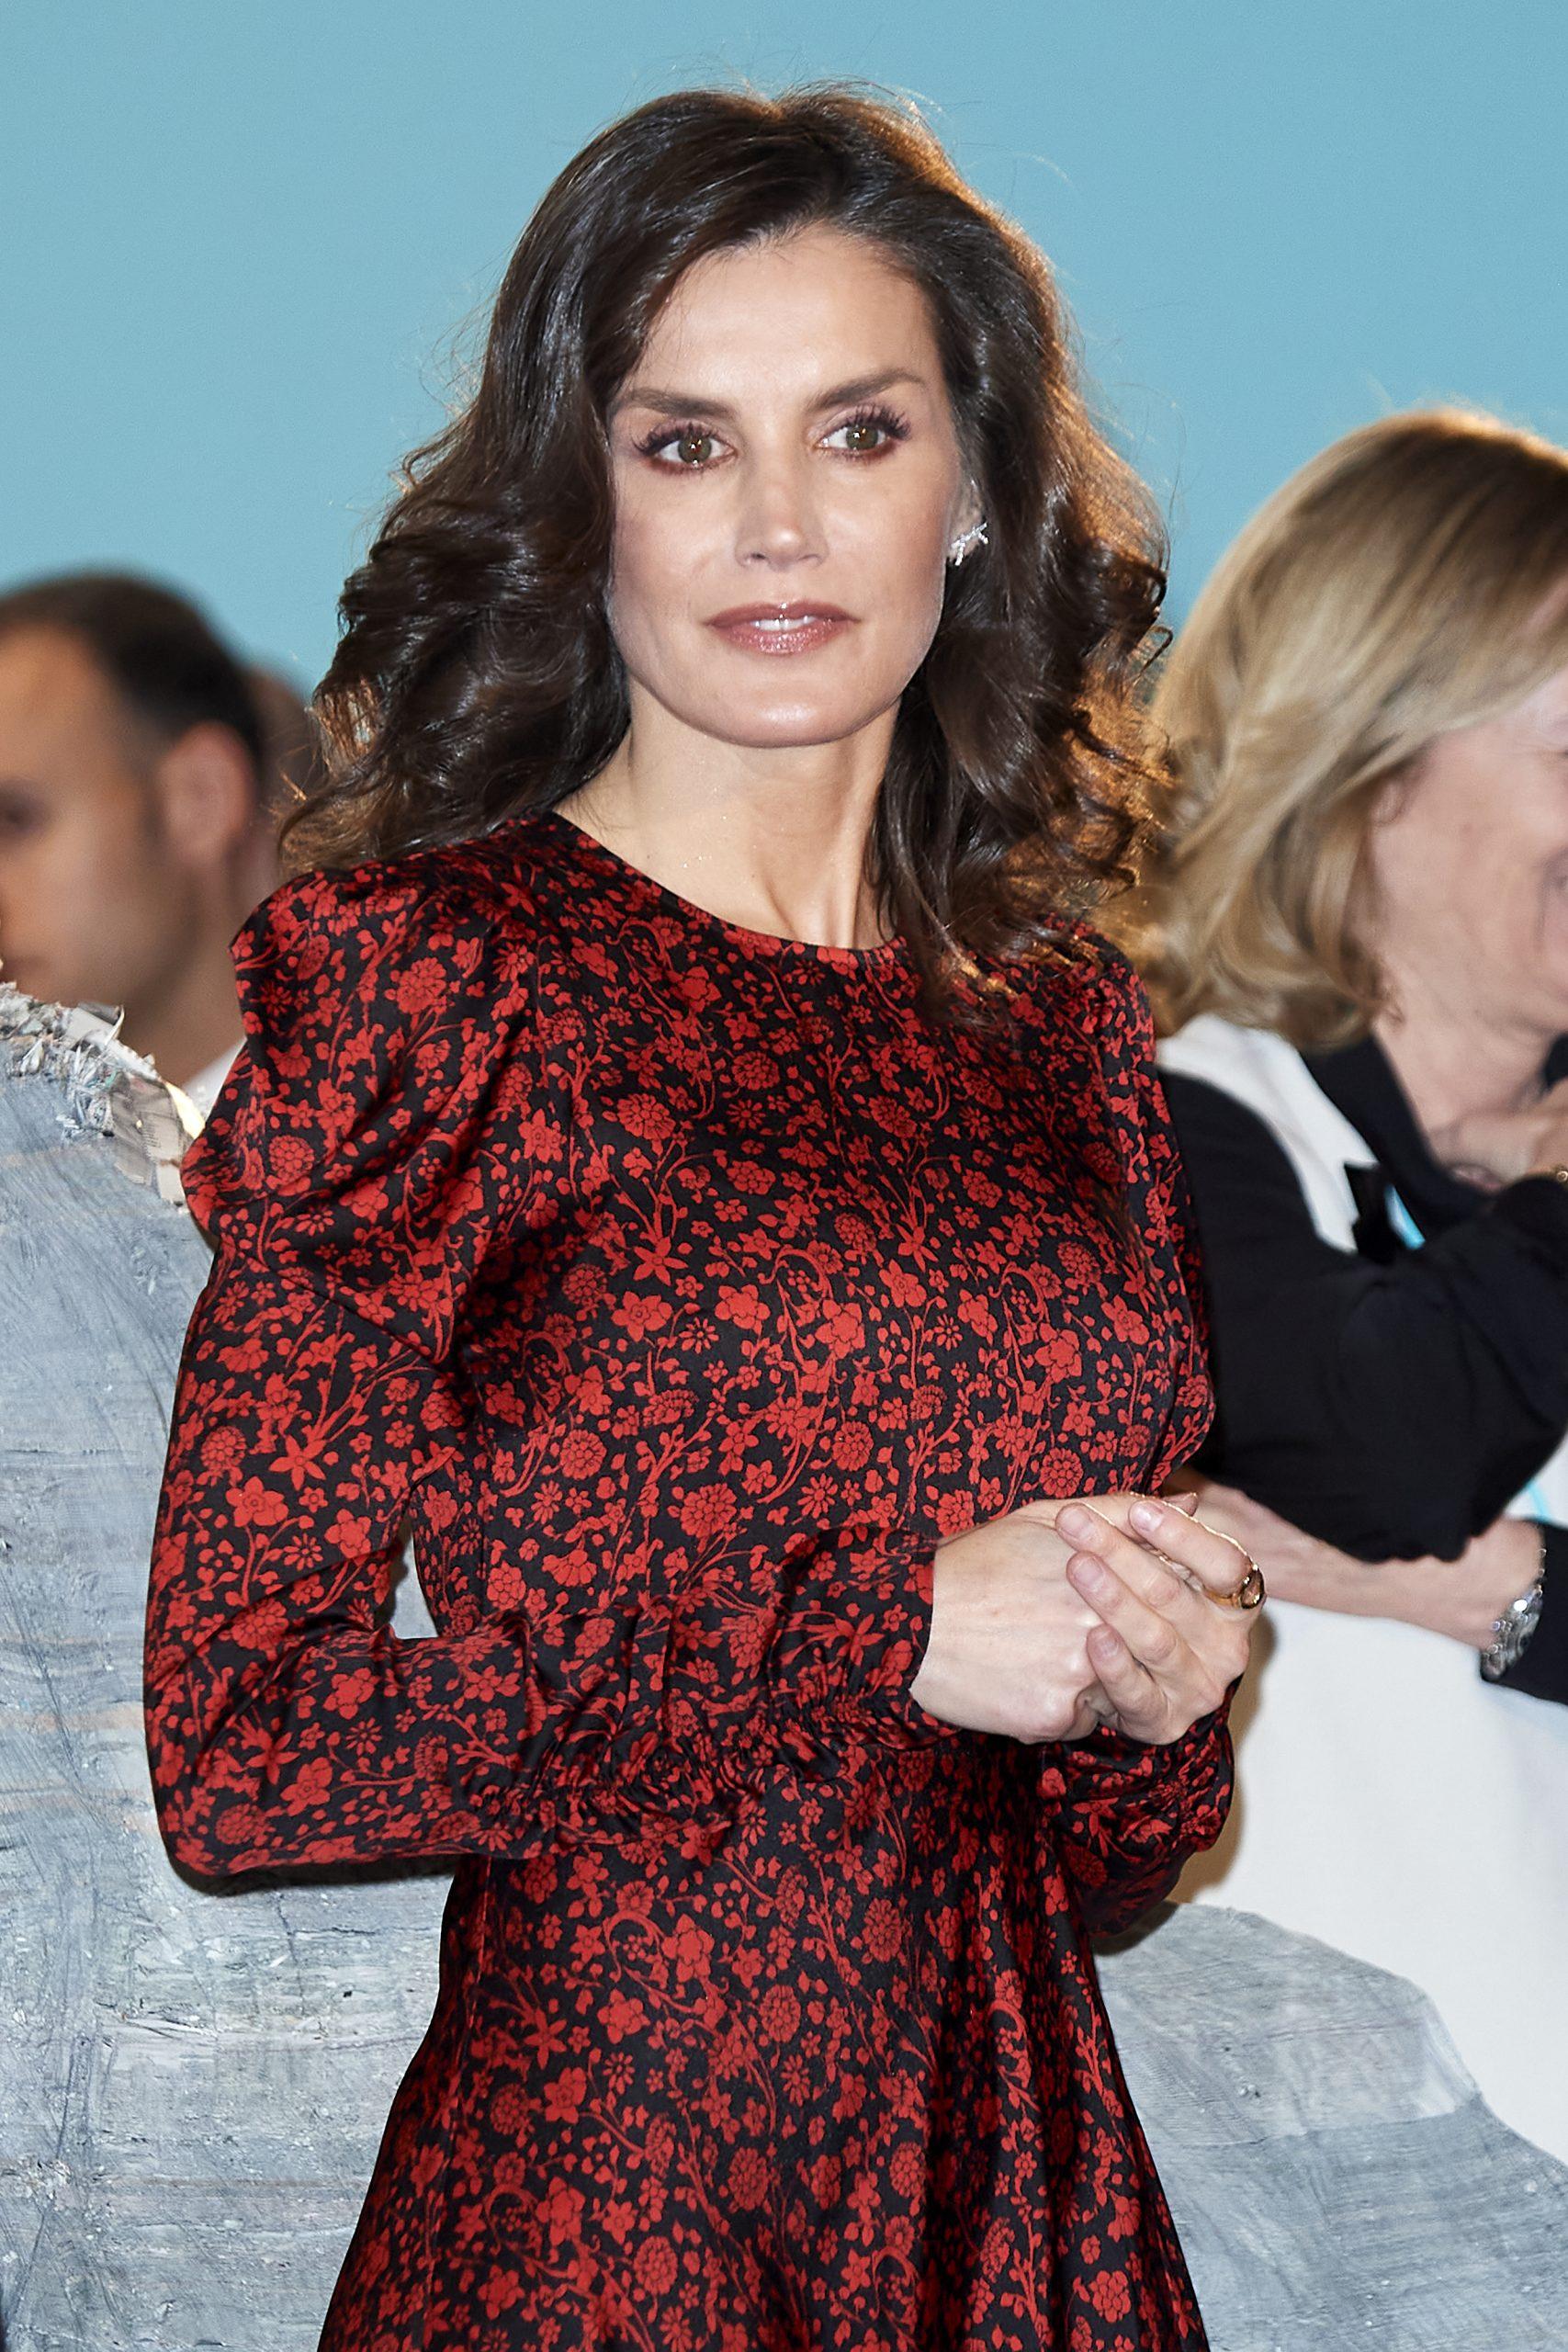 La dieta de la Reina Letizia. /Getty Images